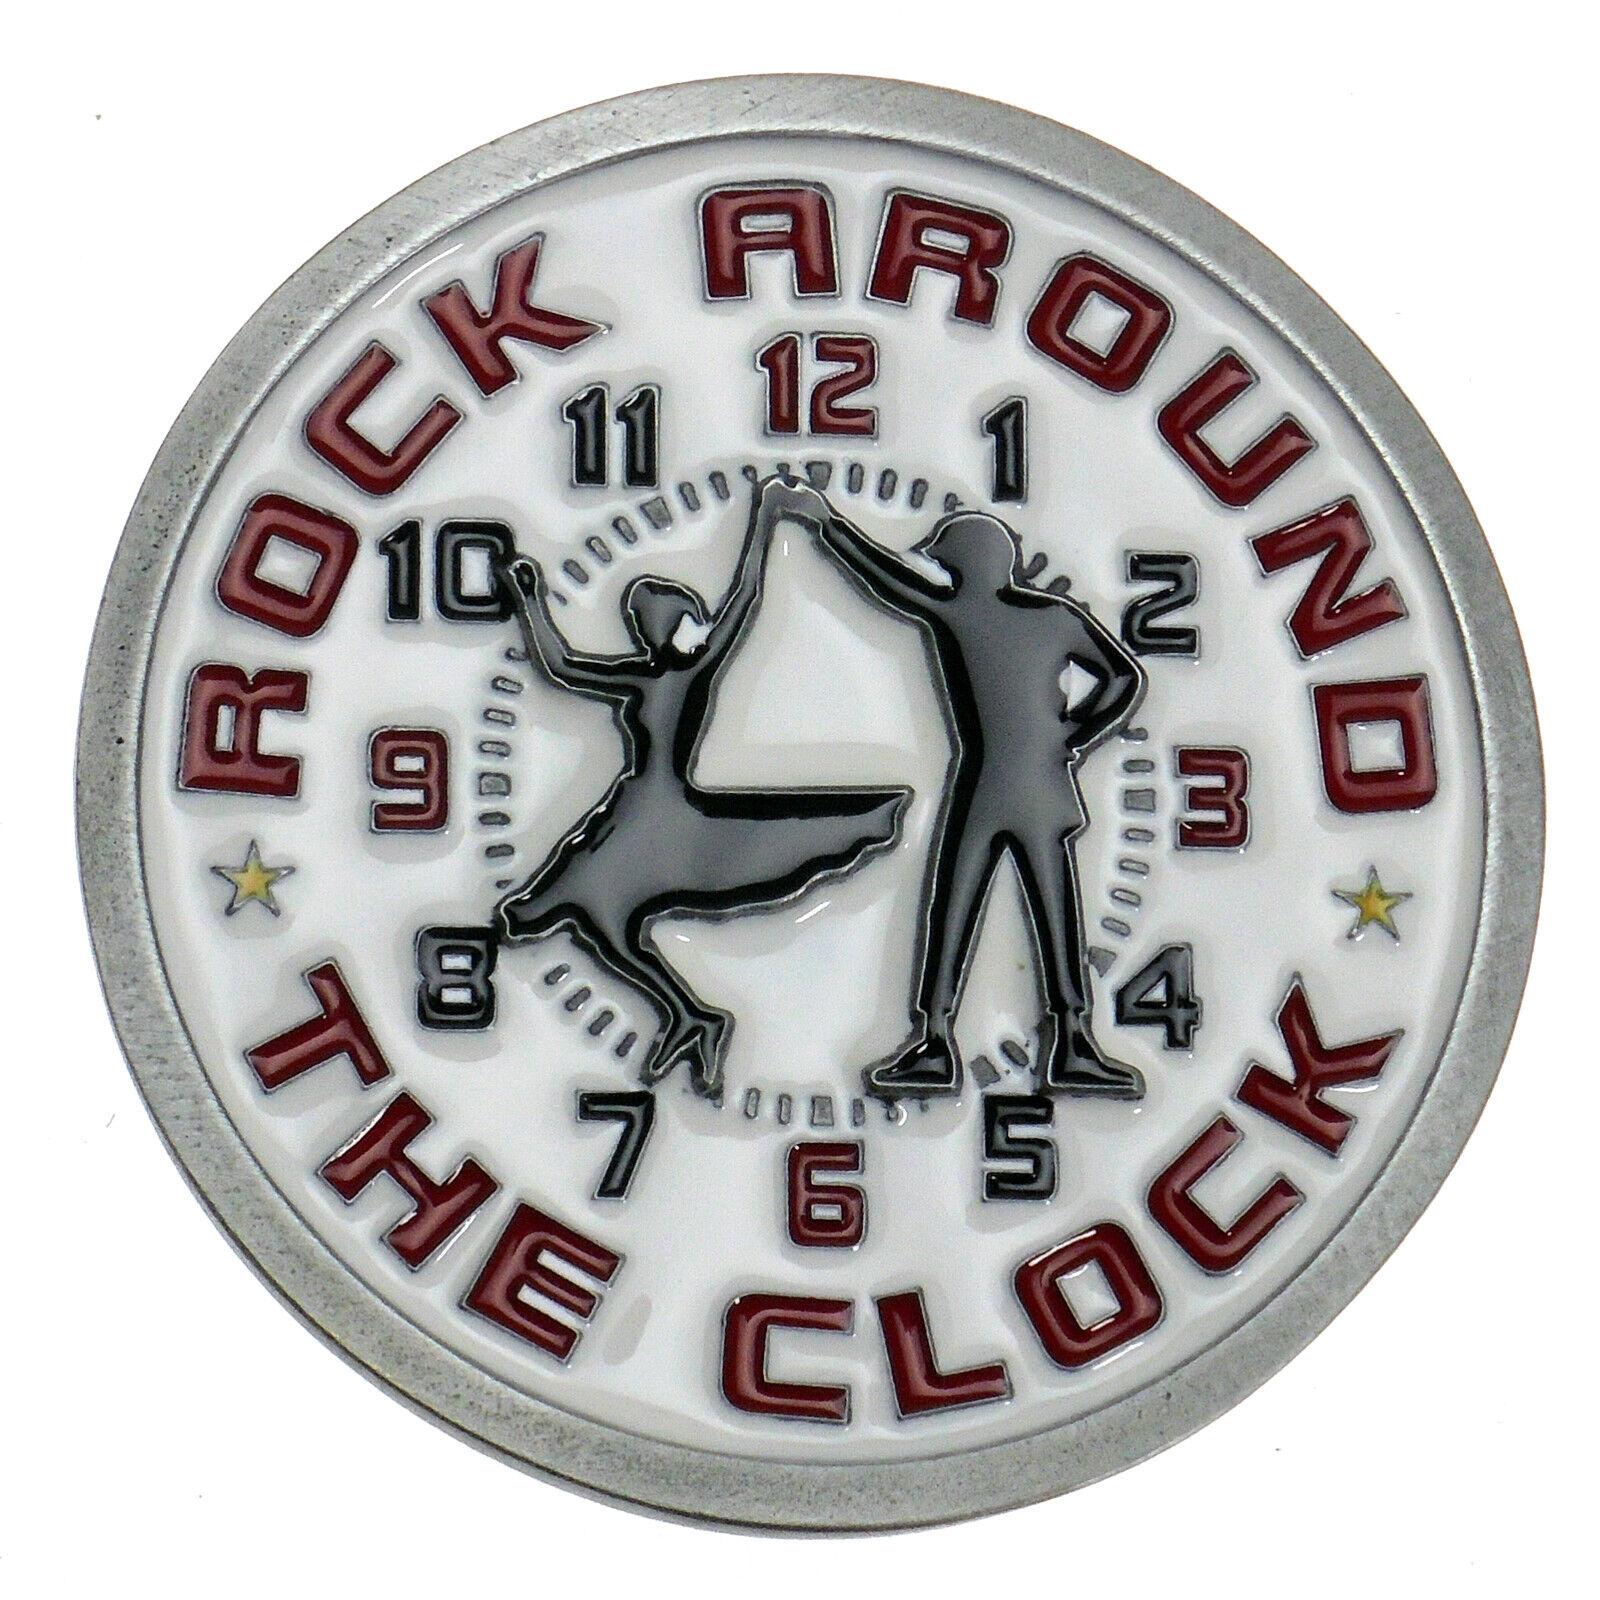 Buckle Rock Around The Clock Rock and Roll Dancing Gürtelschnalle